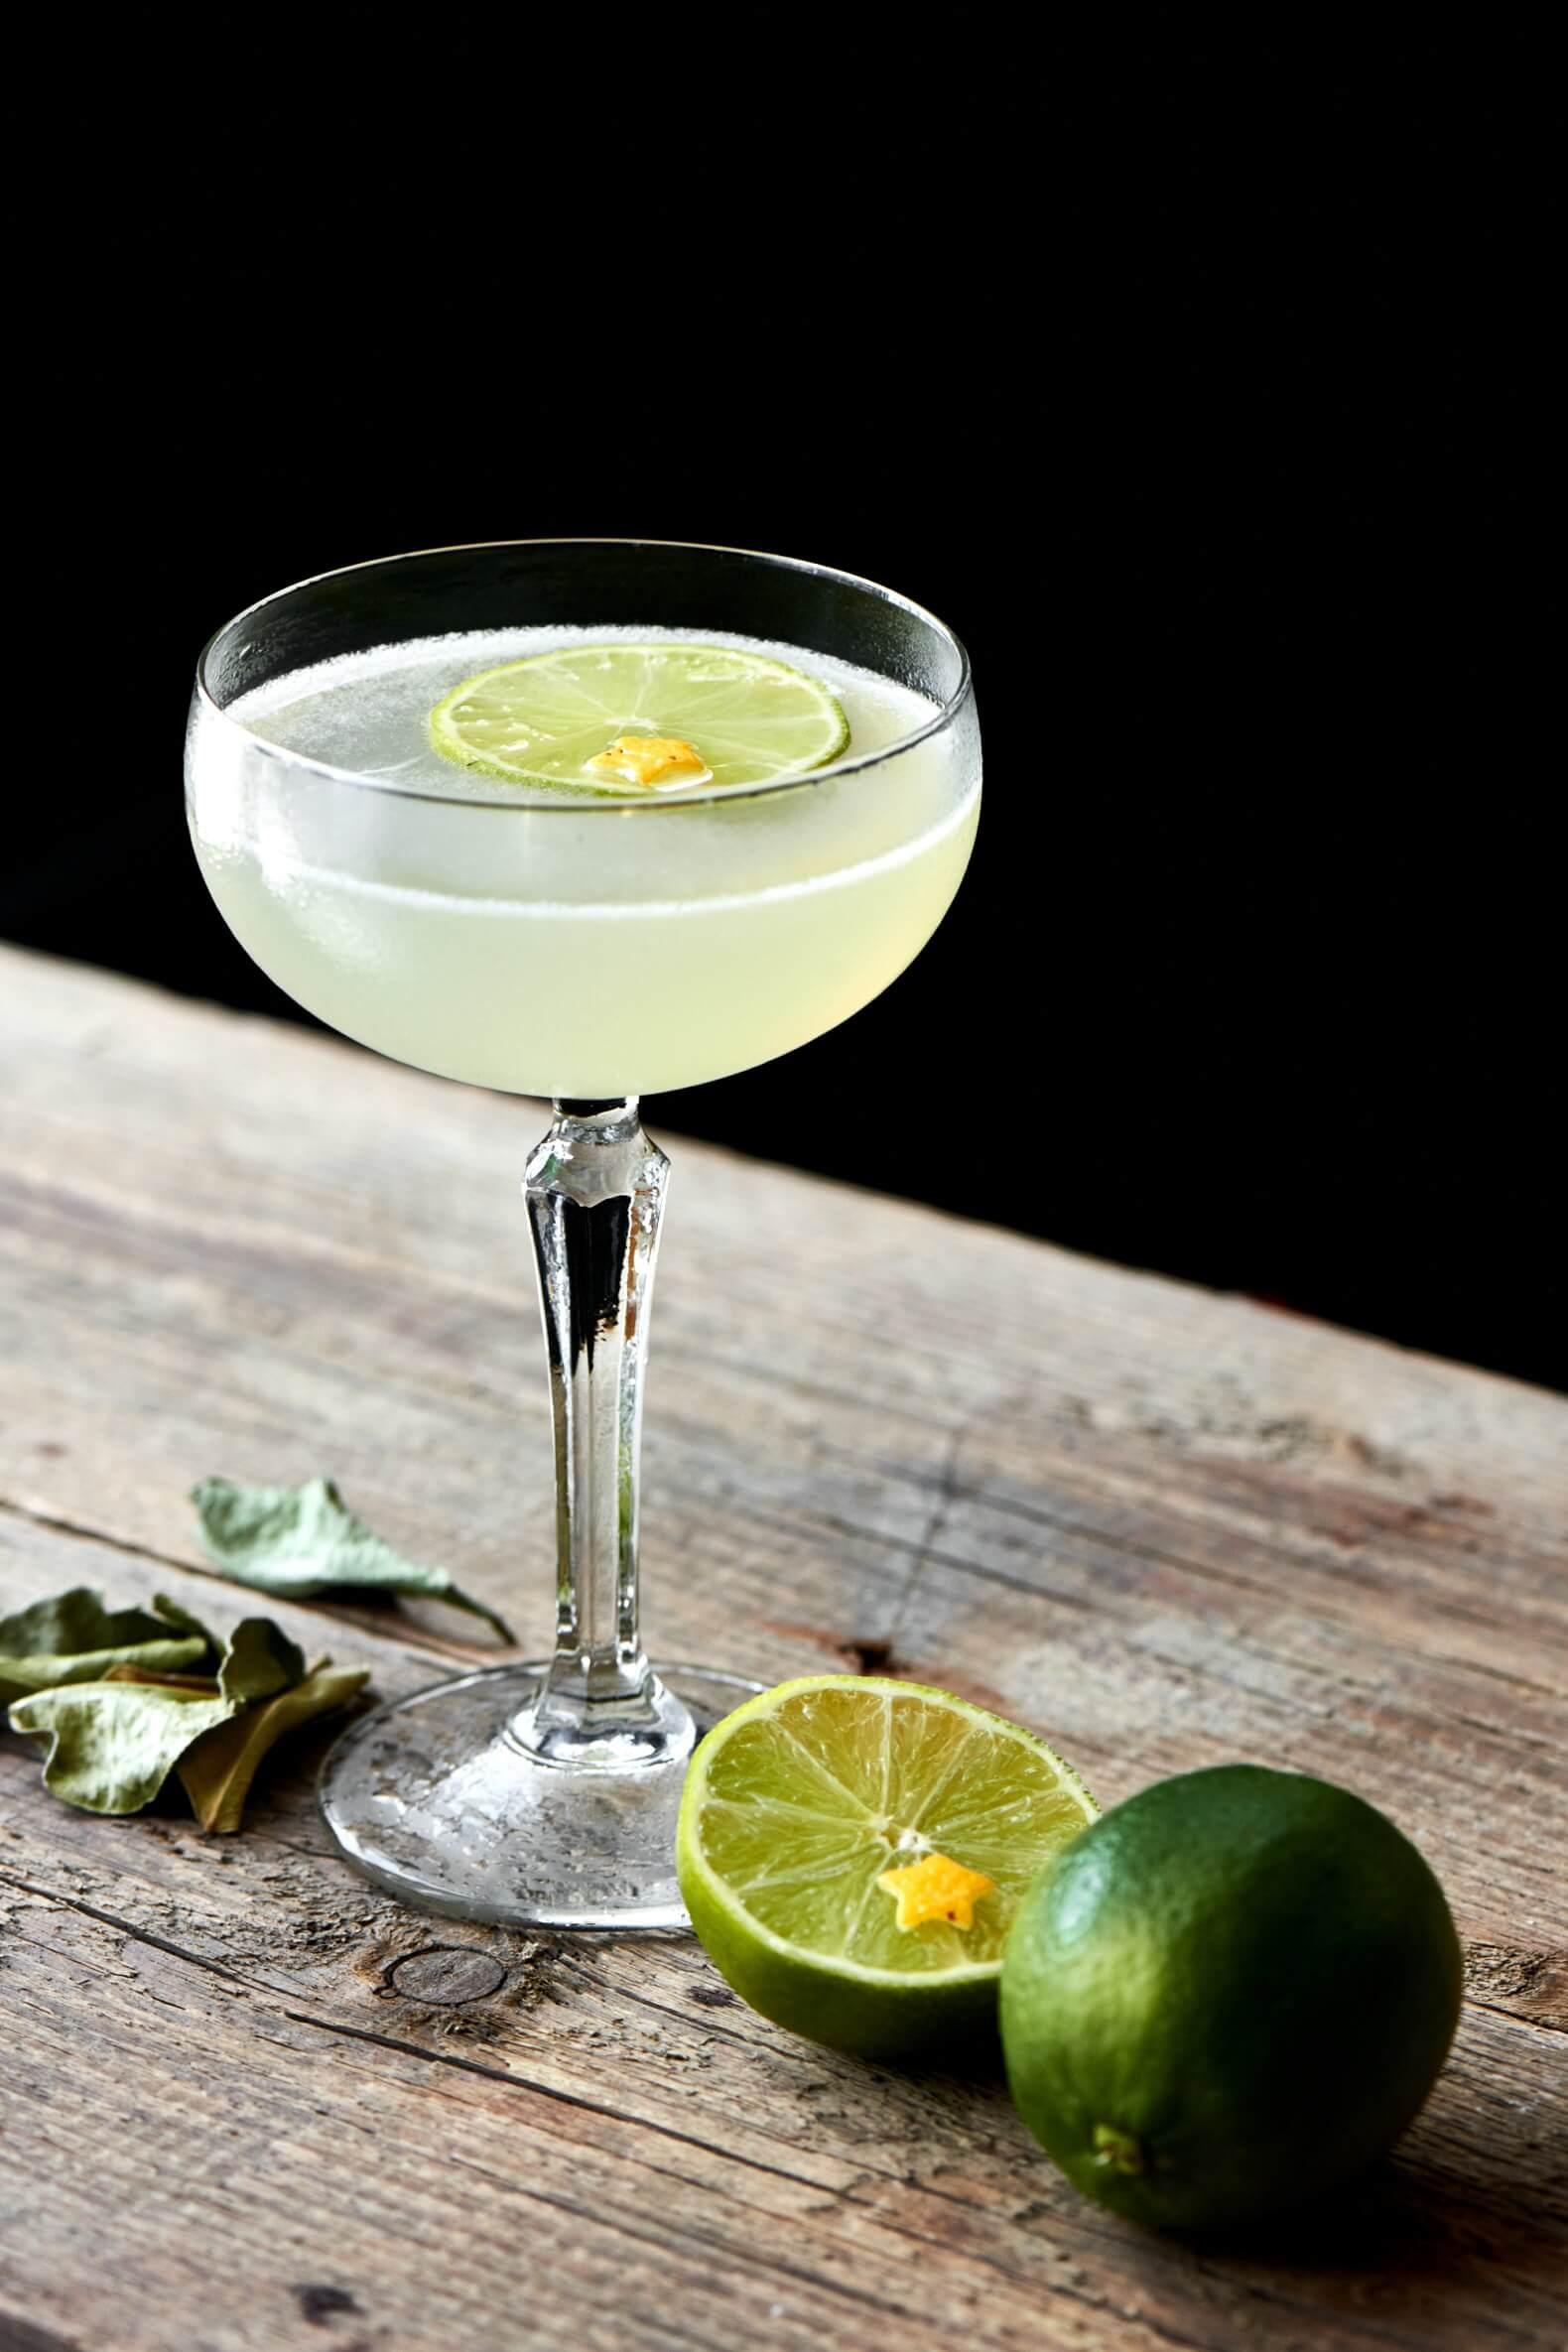 Refreshing Daiquiri cocktails